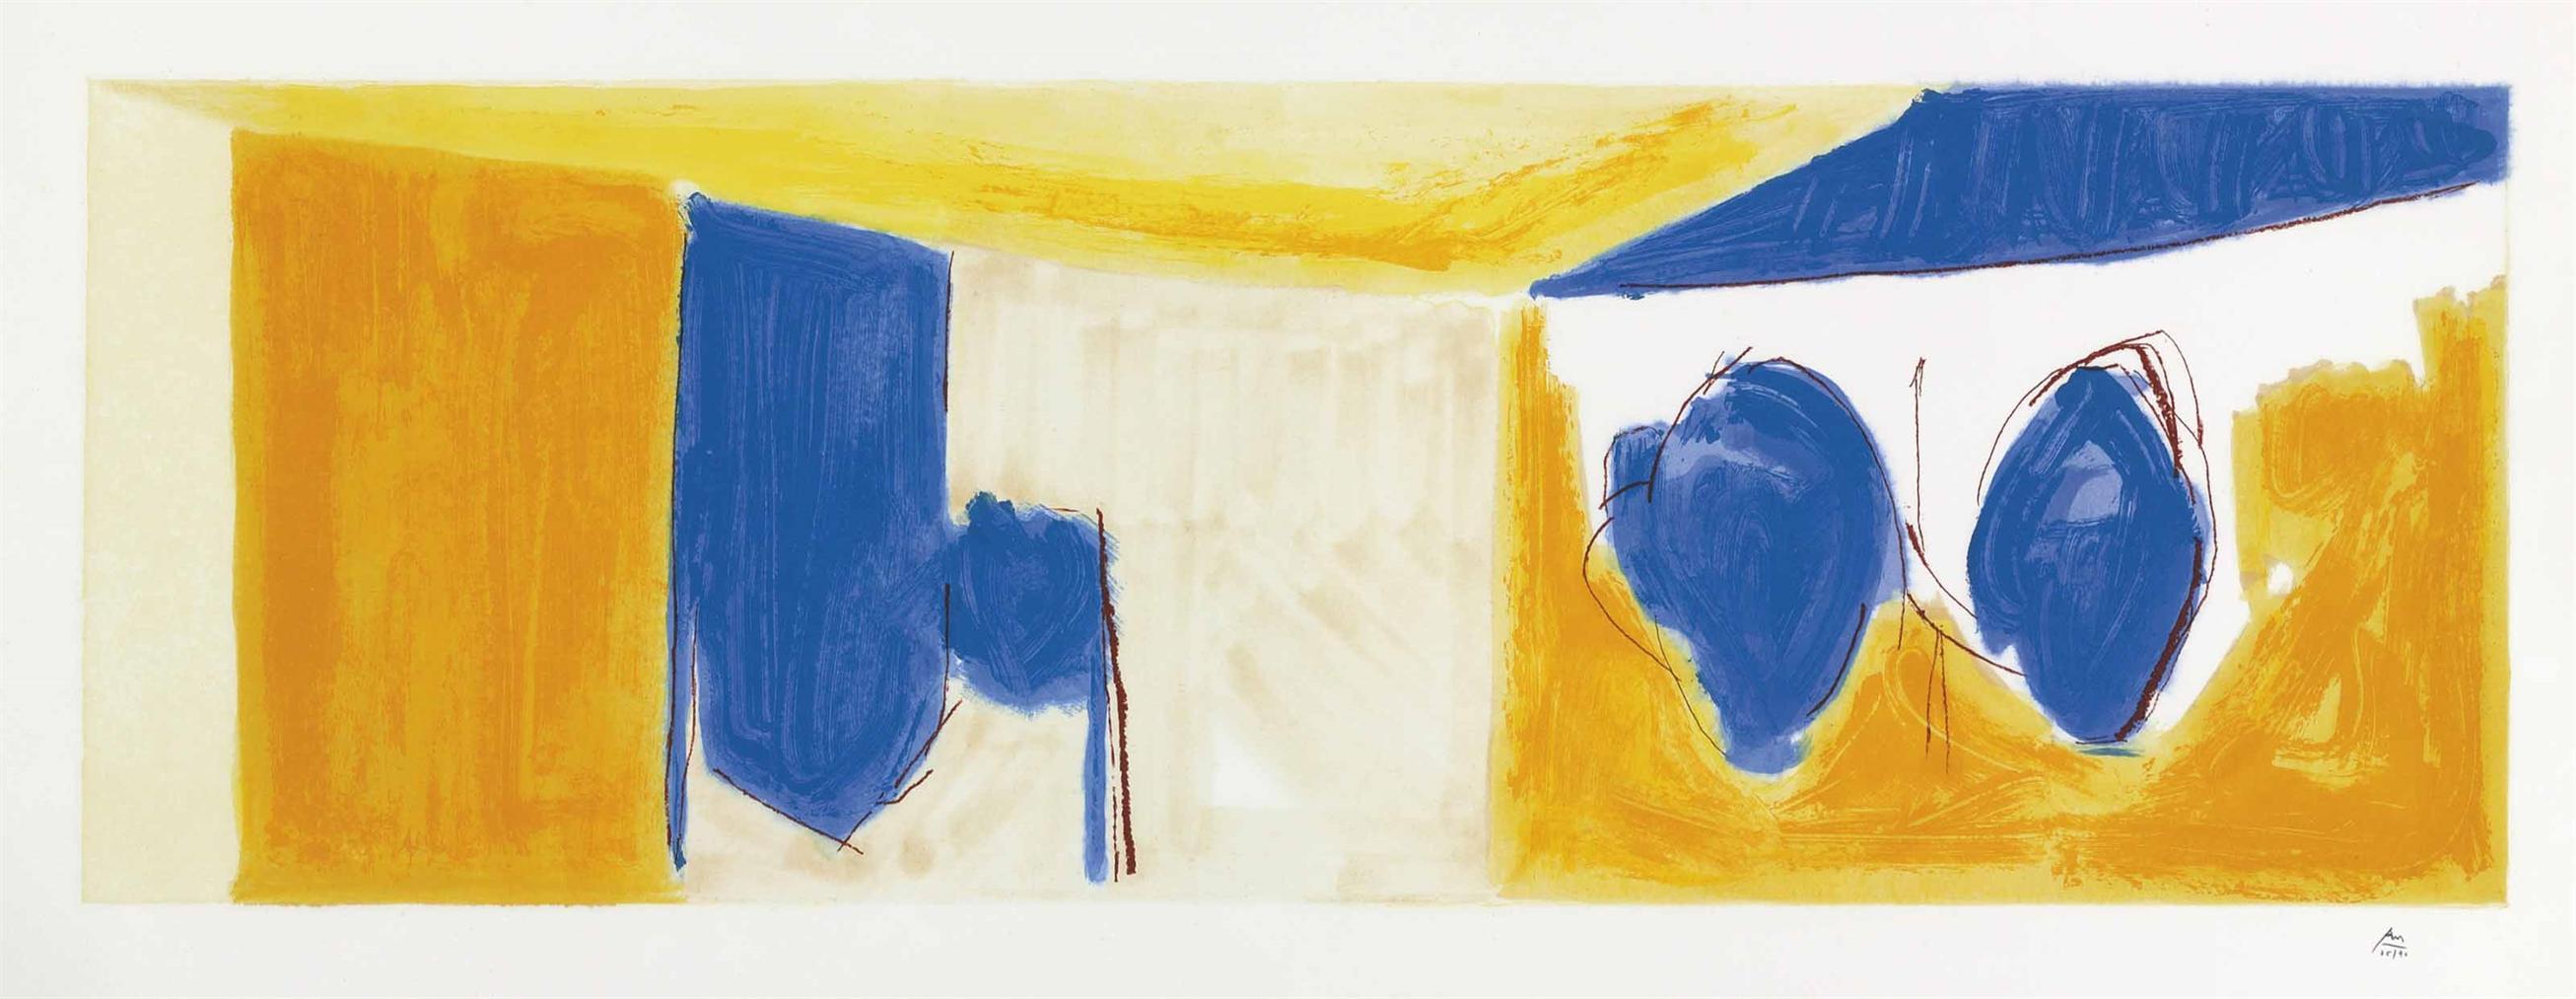 Robert Motherwell-Mediterranean Light-1991